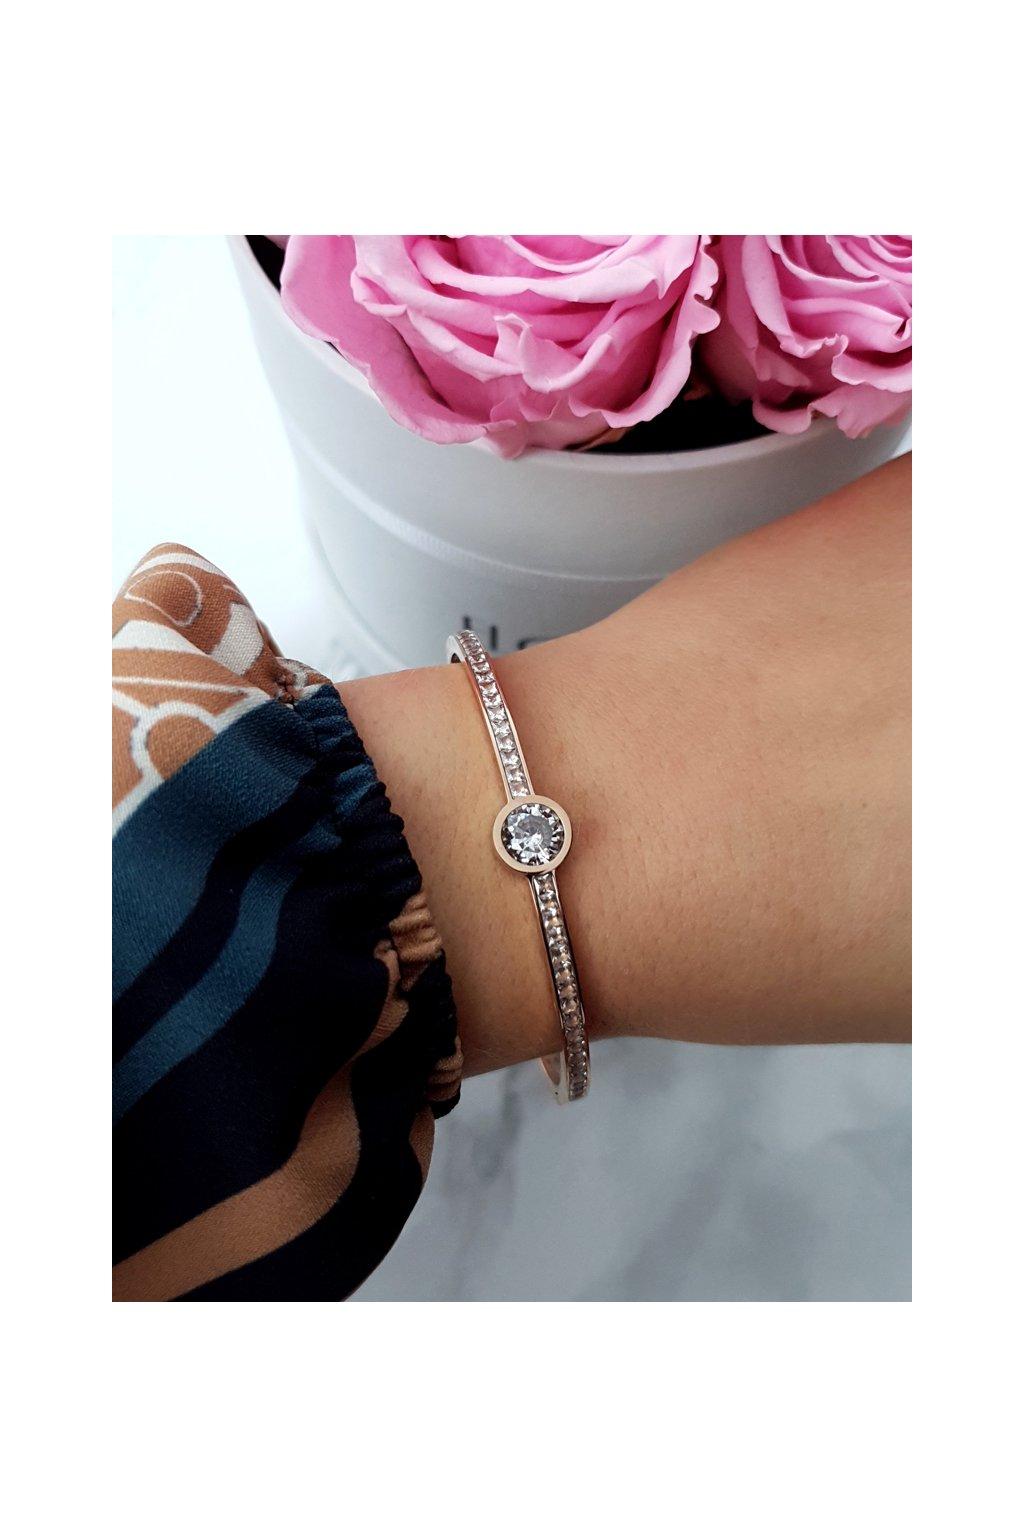 Dámsky náramok oceľ zirkóny kryštálu ružové zlato Quento